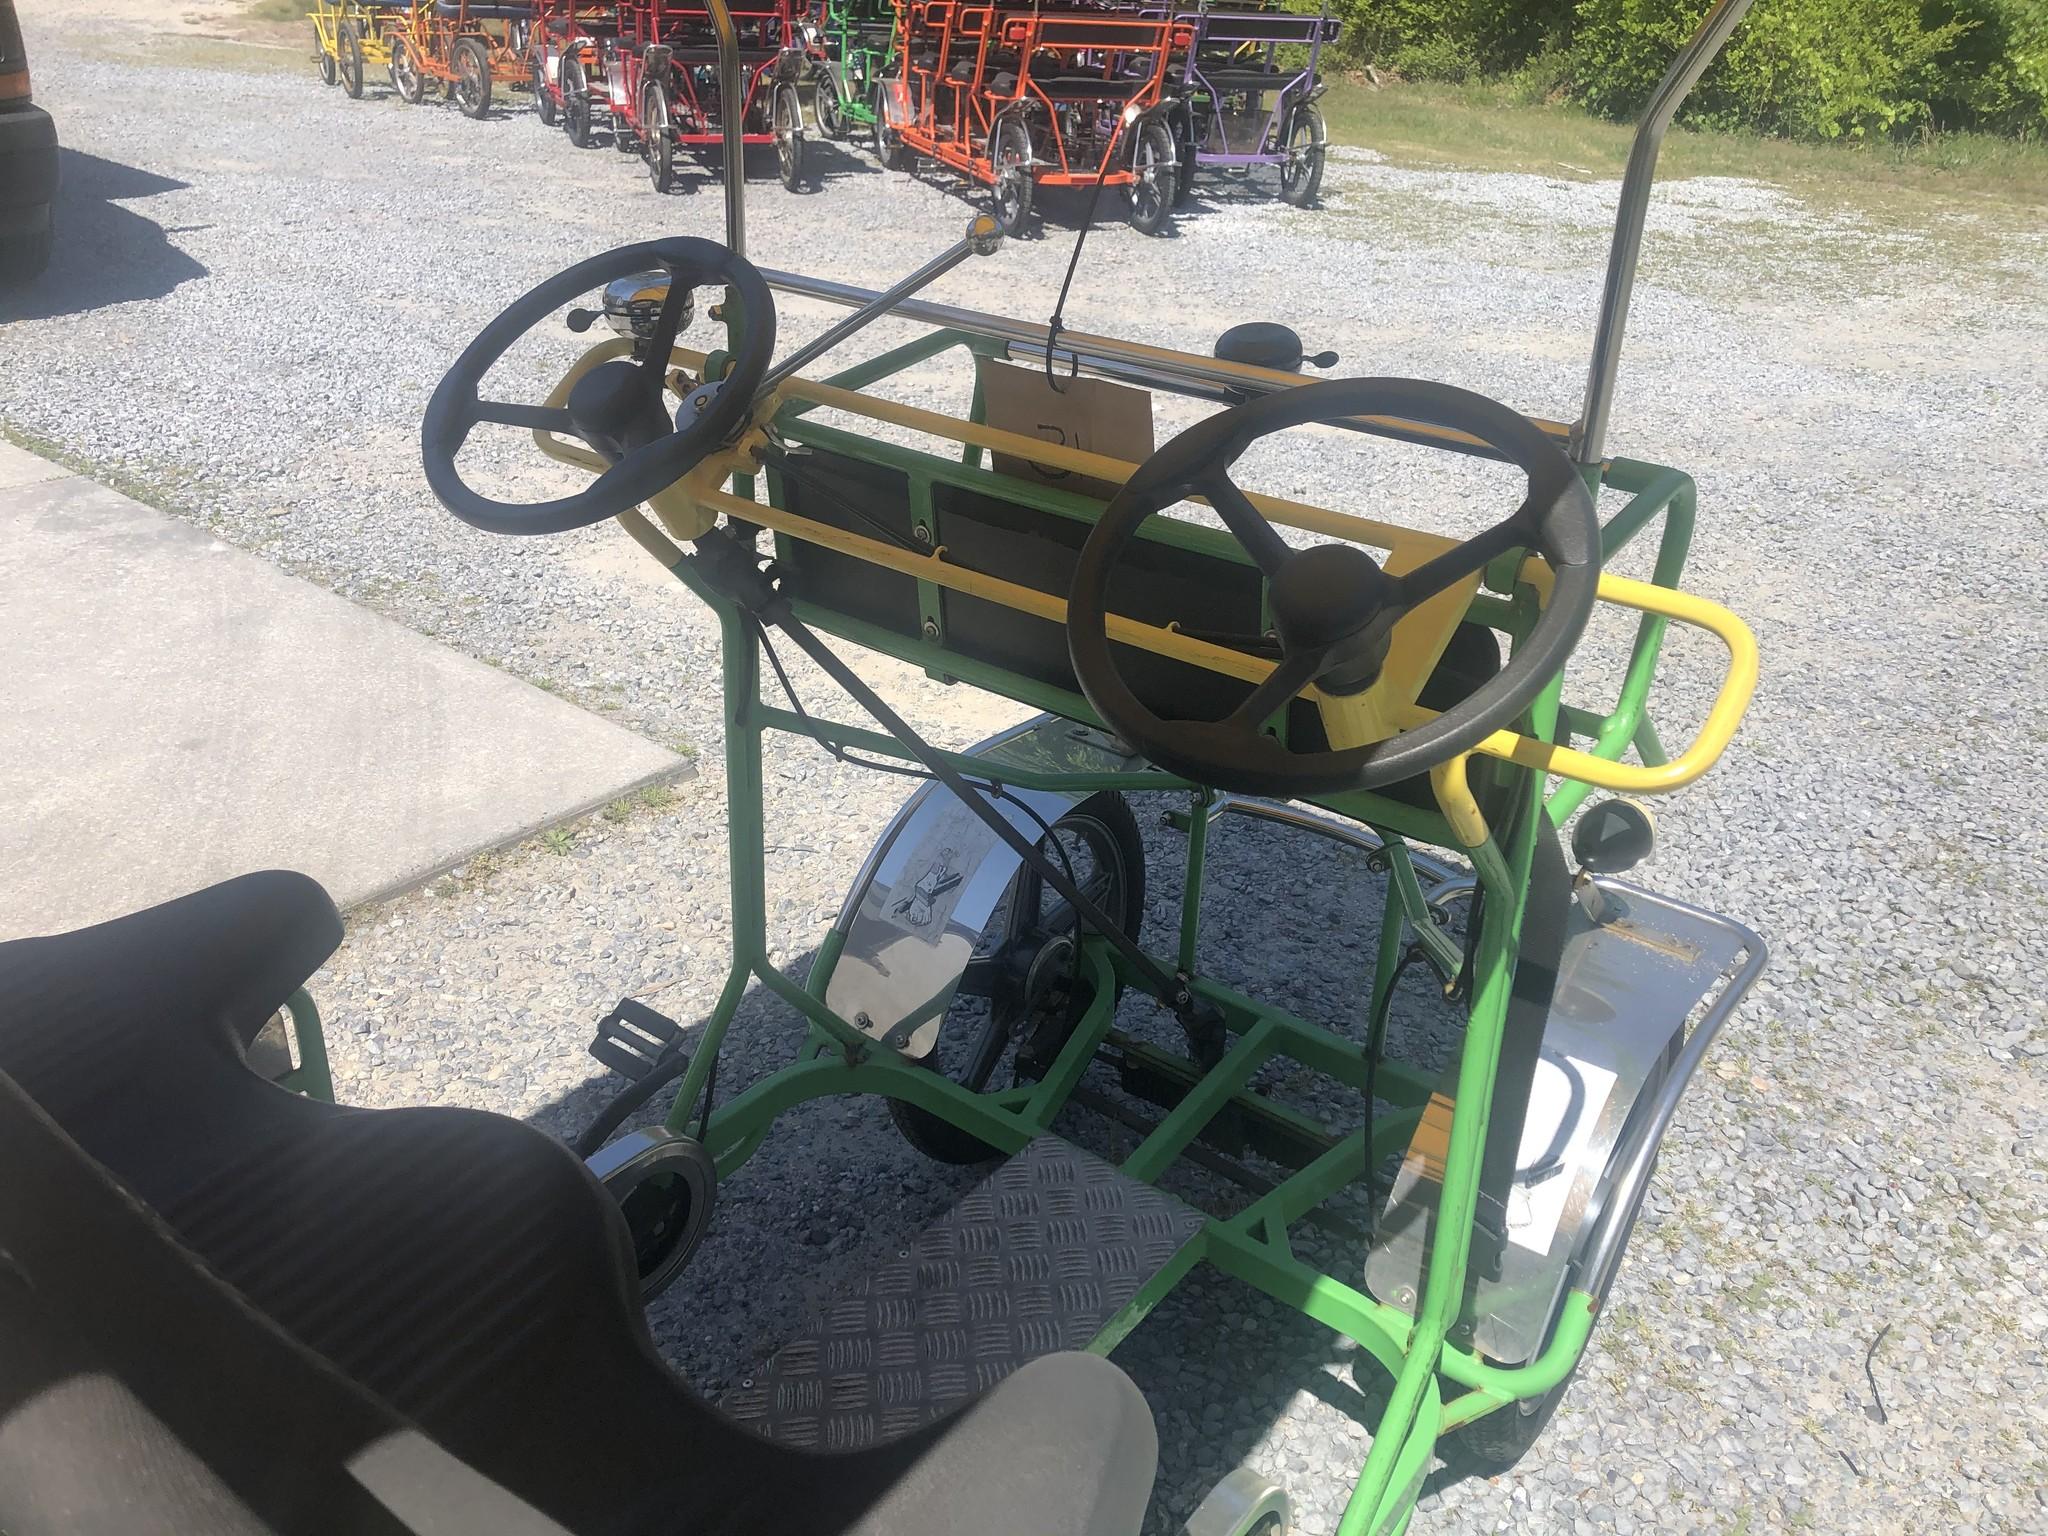 Used 2019 NewTecnoArt Selene Bus Surrey Bike (Green & Yellow w/ Yellow Top)